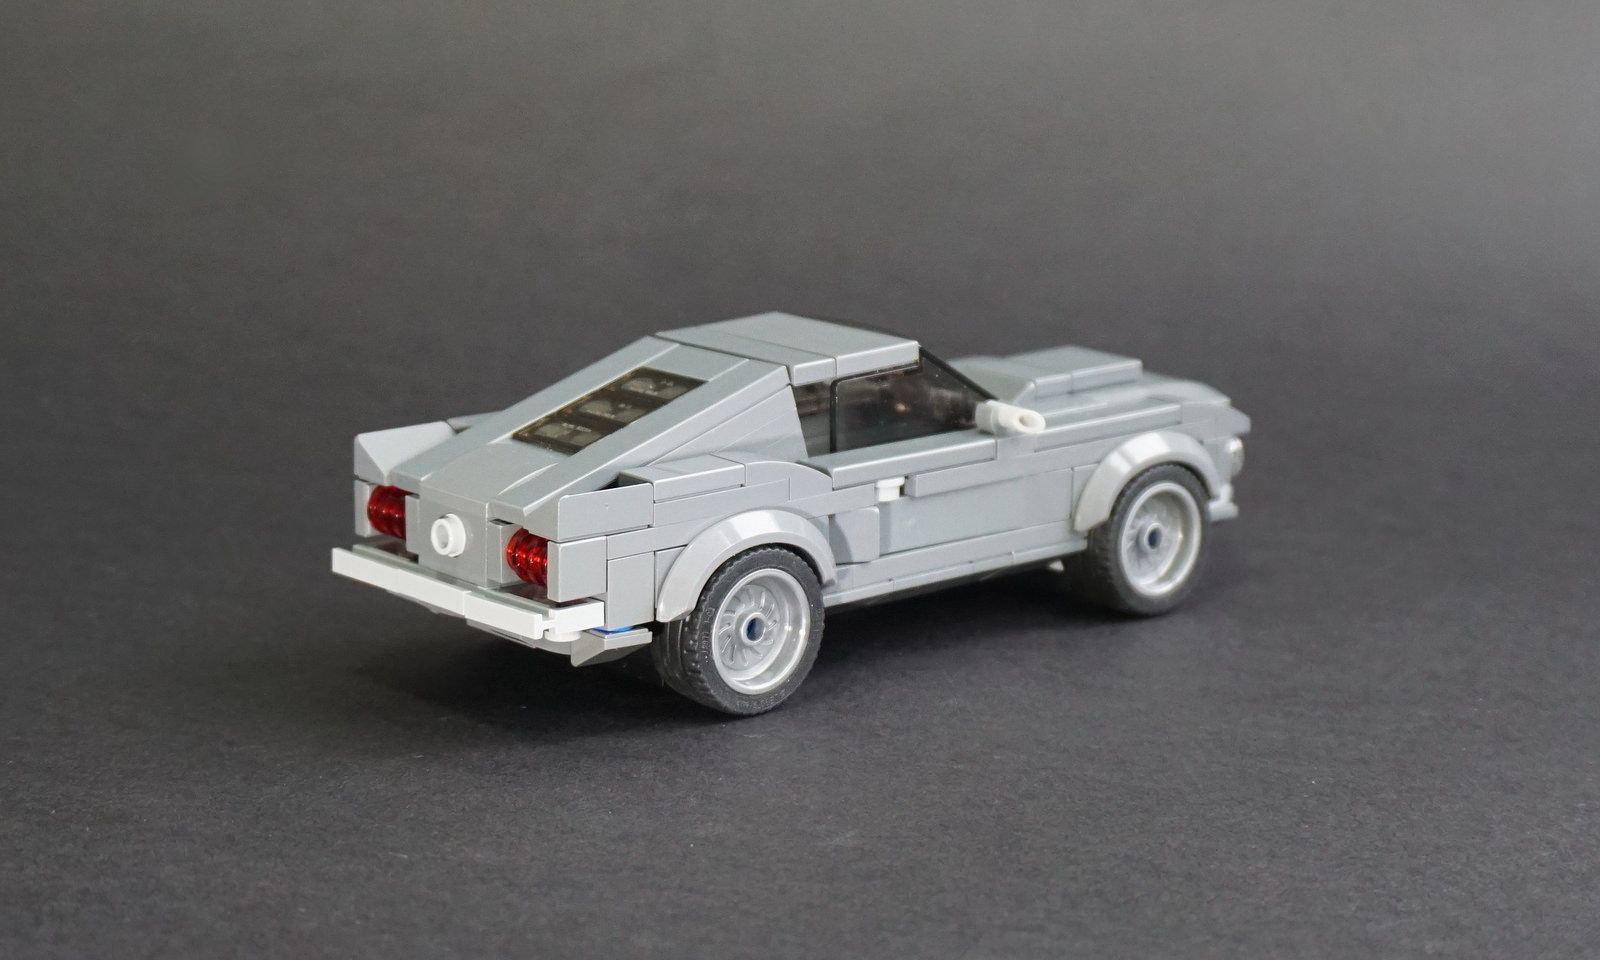 Lego 1968 ford mustang fastback 02 by jonathan ẹlliott